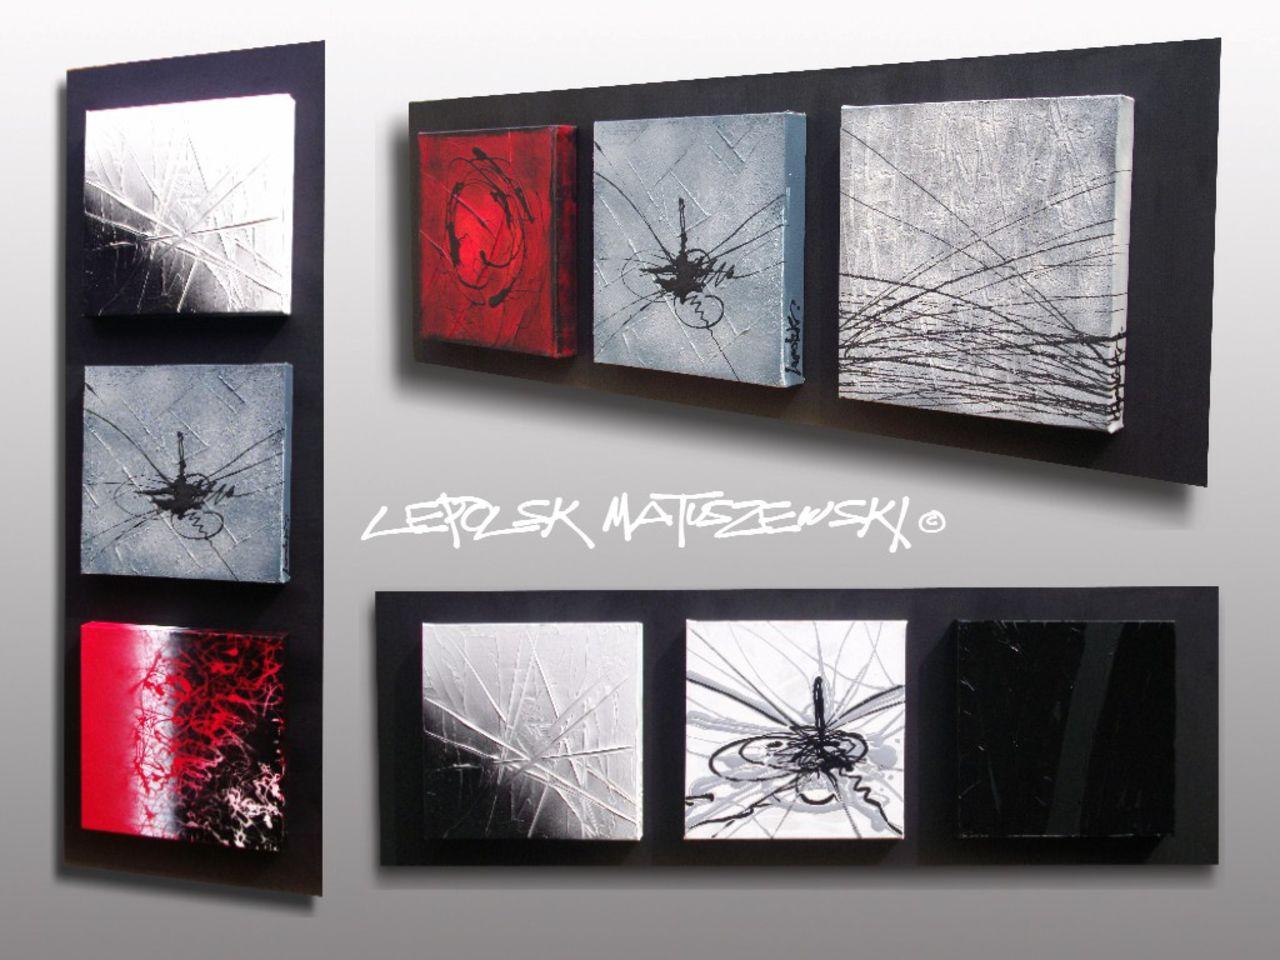 MISTER K  (Lepolsk Matuszewski) Abstrait petis formats Lepolsk Matuszewski expressionnisme abstrait, artiste peintre plasticien